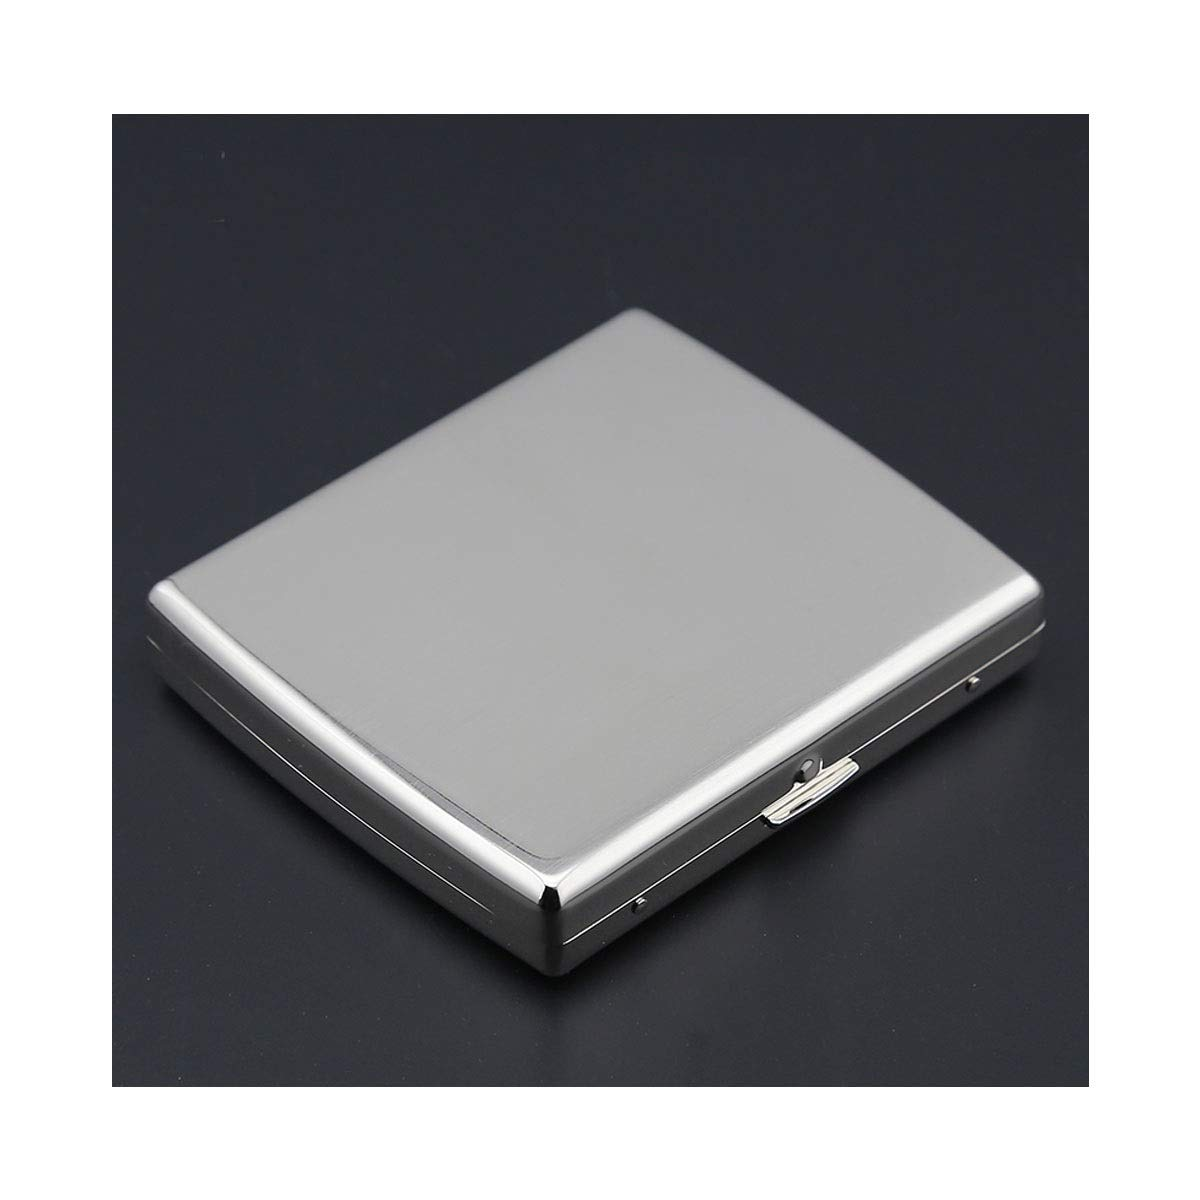 ZHONGYUE Ultra-Thin Cigarette Case, Male and Female Cigarette Case, Portable Creative Simple Personality Cigarette Case Unique Design, Sturdy and Lightweight. (Style : B)